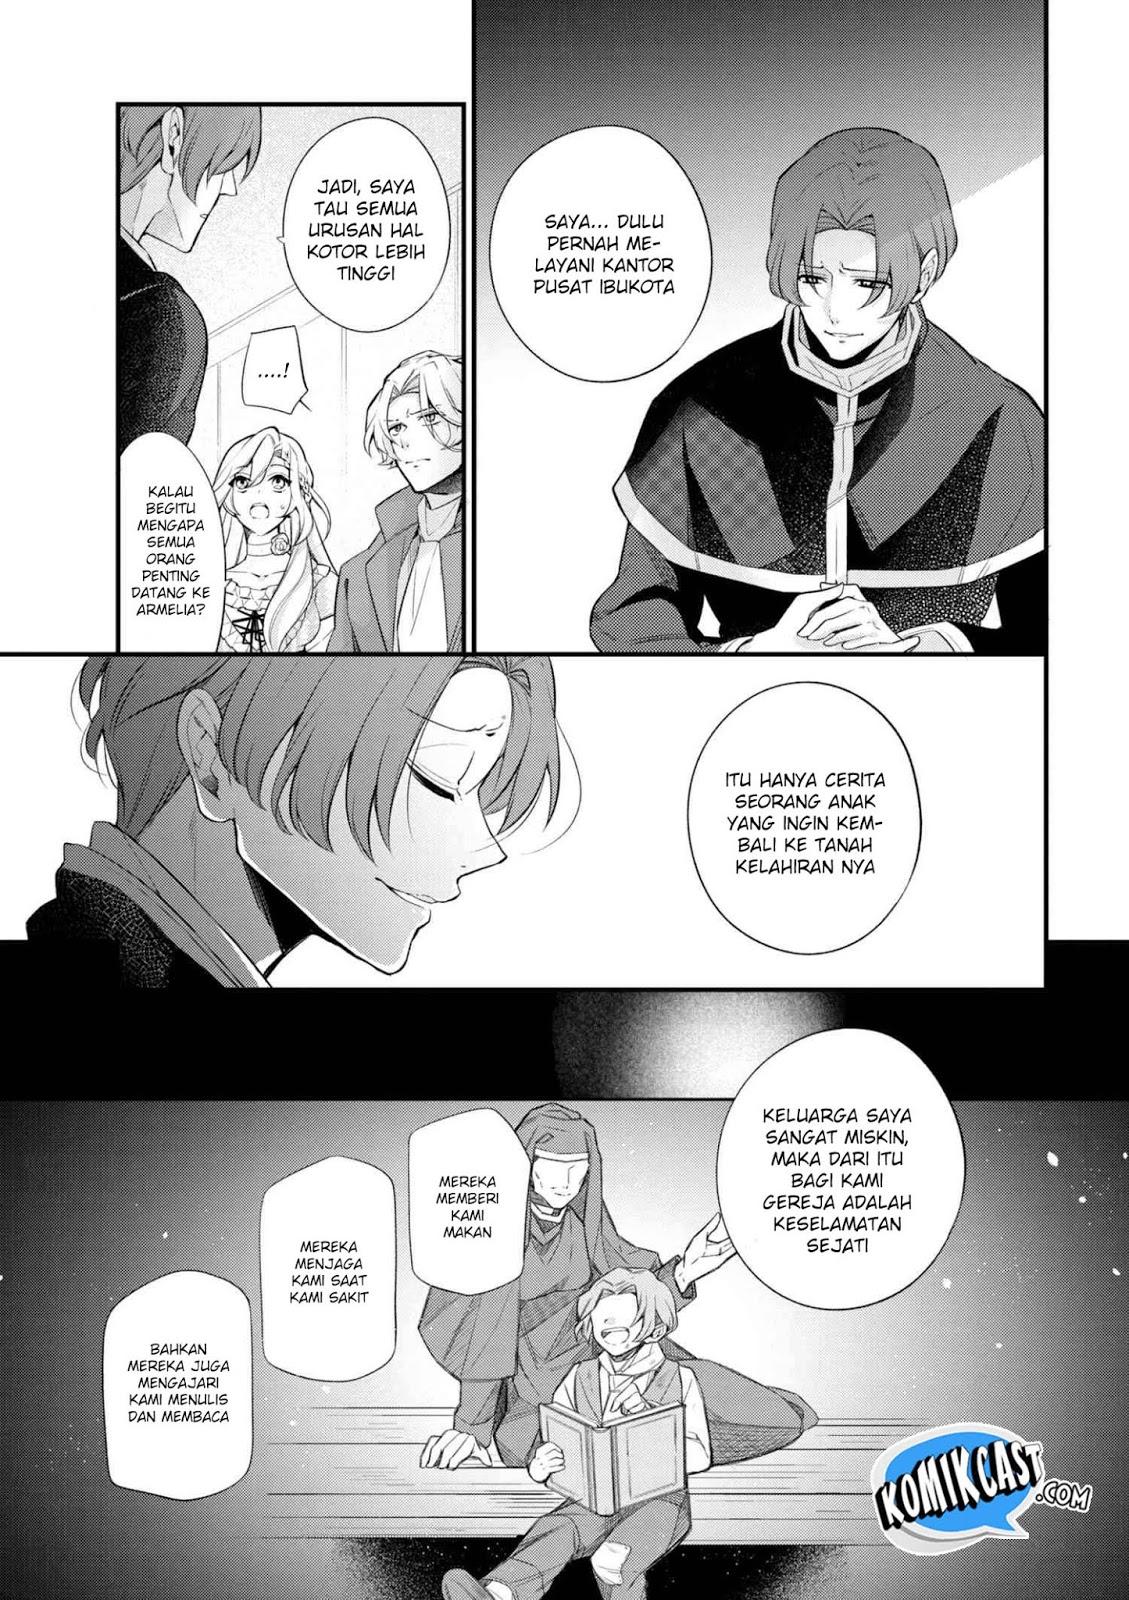 Koushaku Reijou no Tashinami: Chapter 42.2 - Page 4